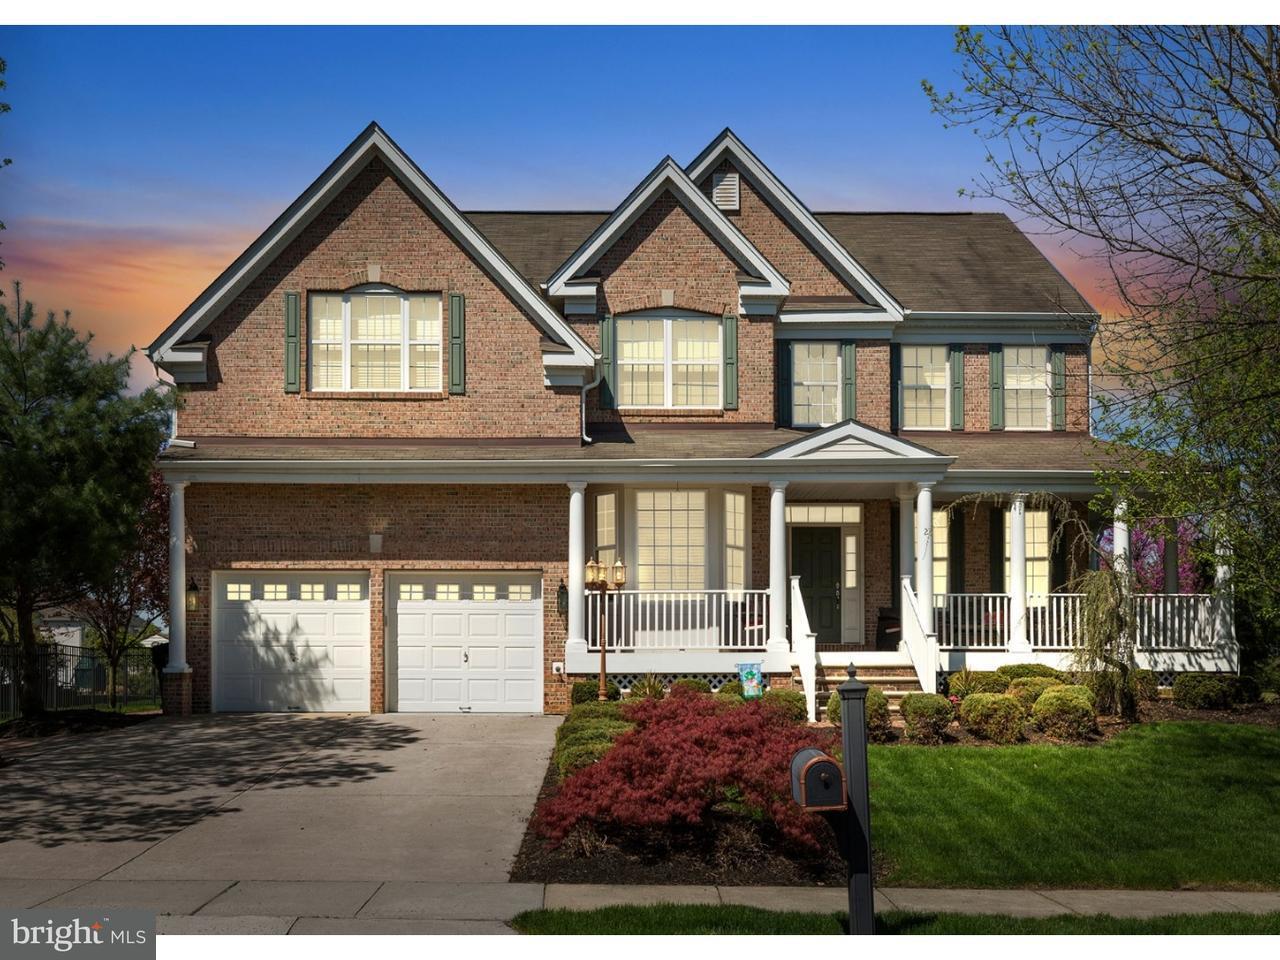 Photo of home for sale at 2 Banbury Road, Lumberton NJ